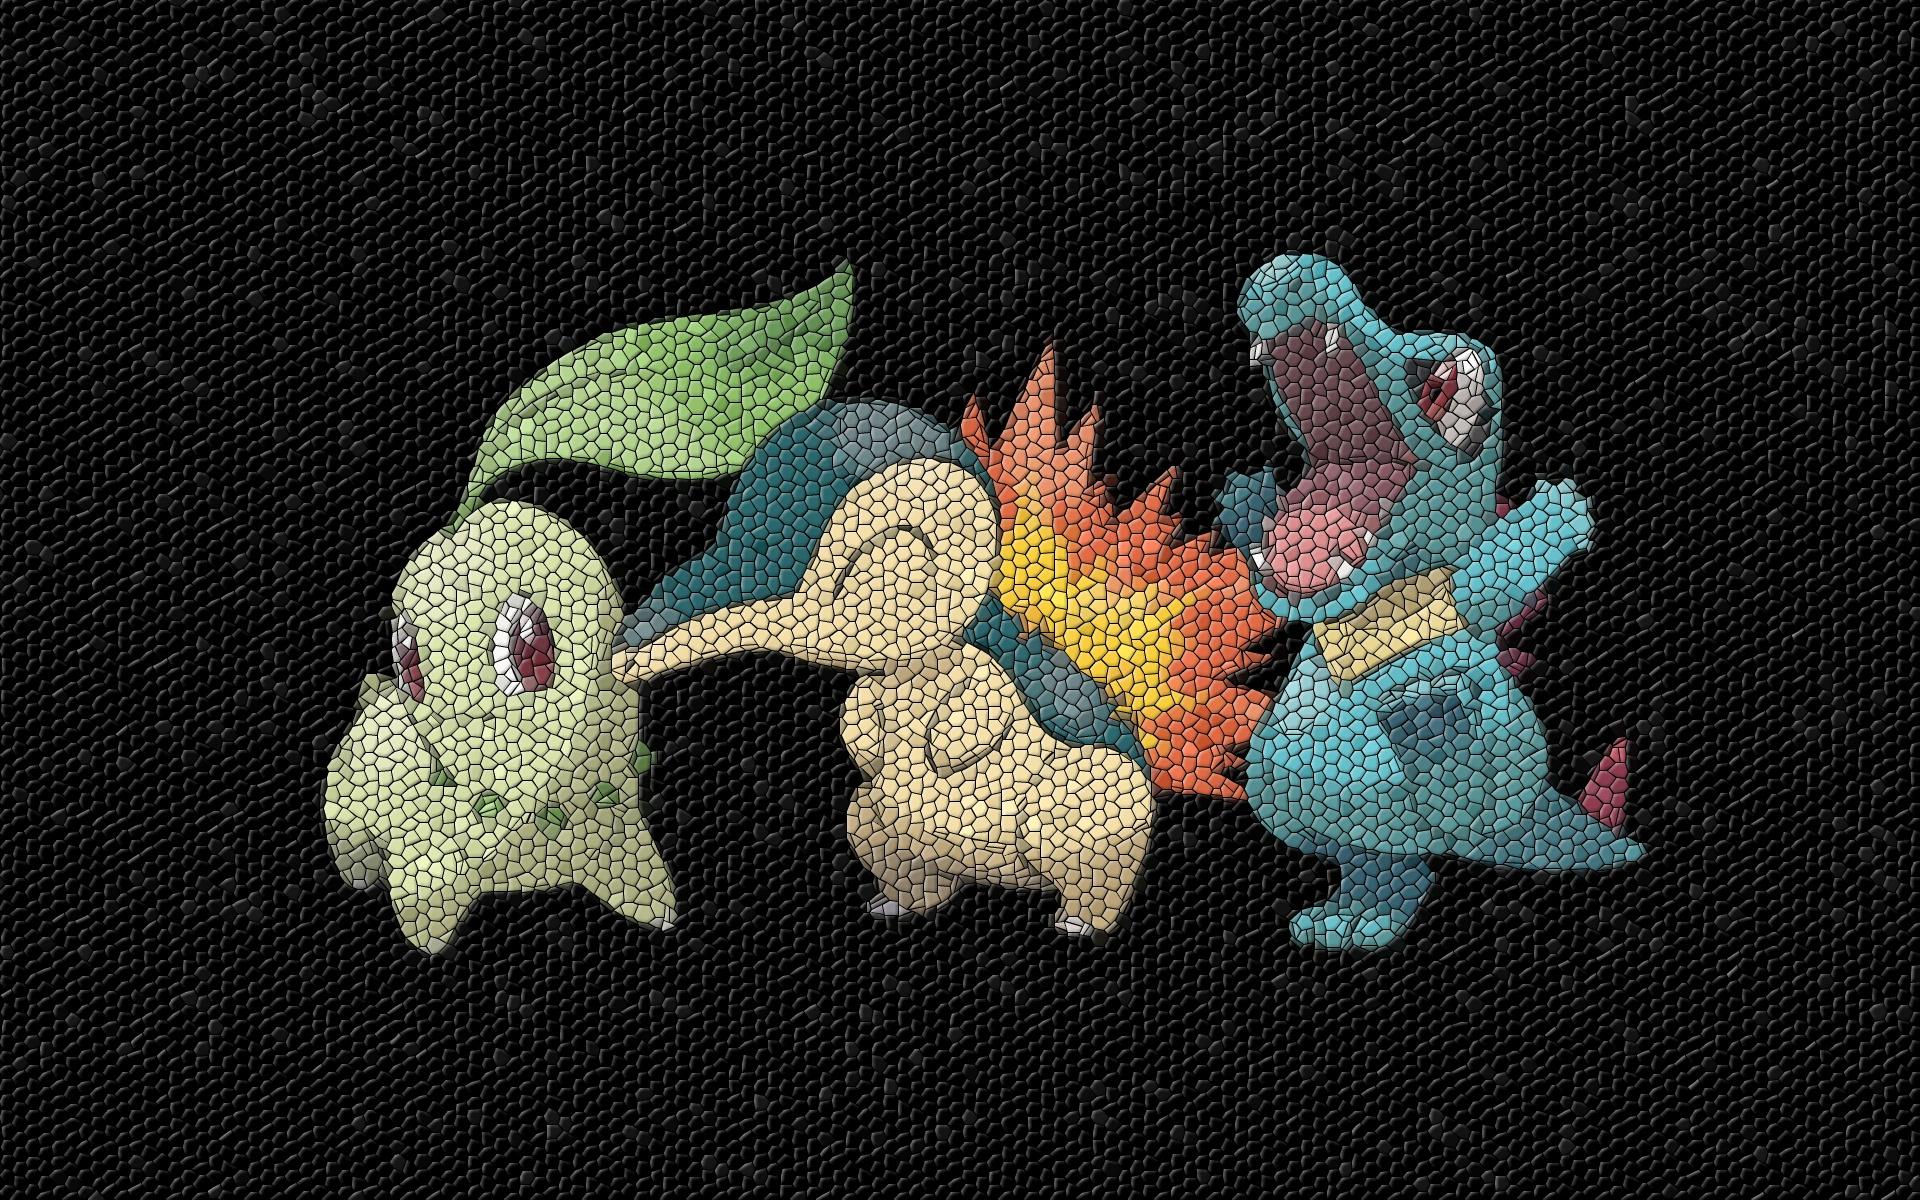 Pokemon Mosaic Totodile Cyndaquil HD Wallpaper